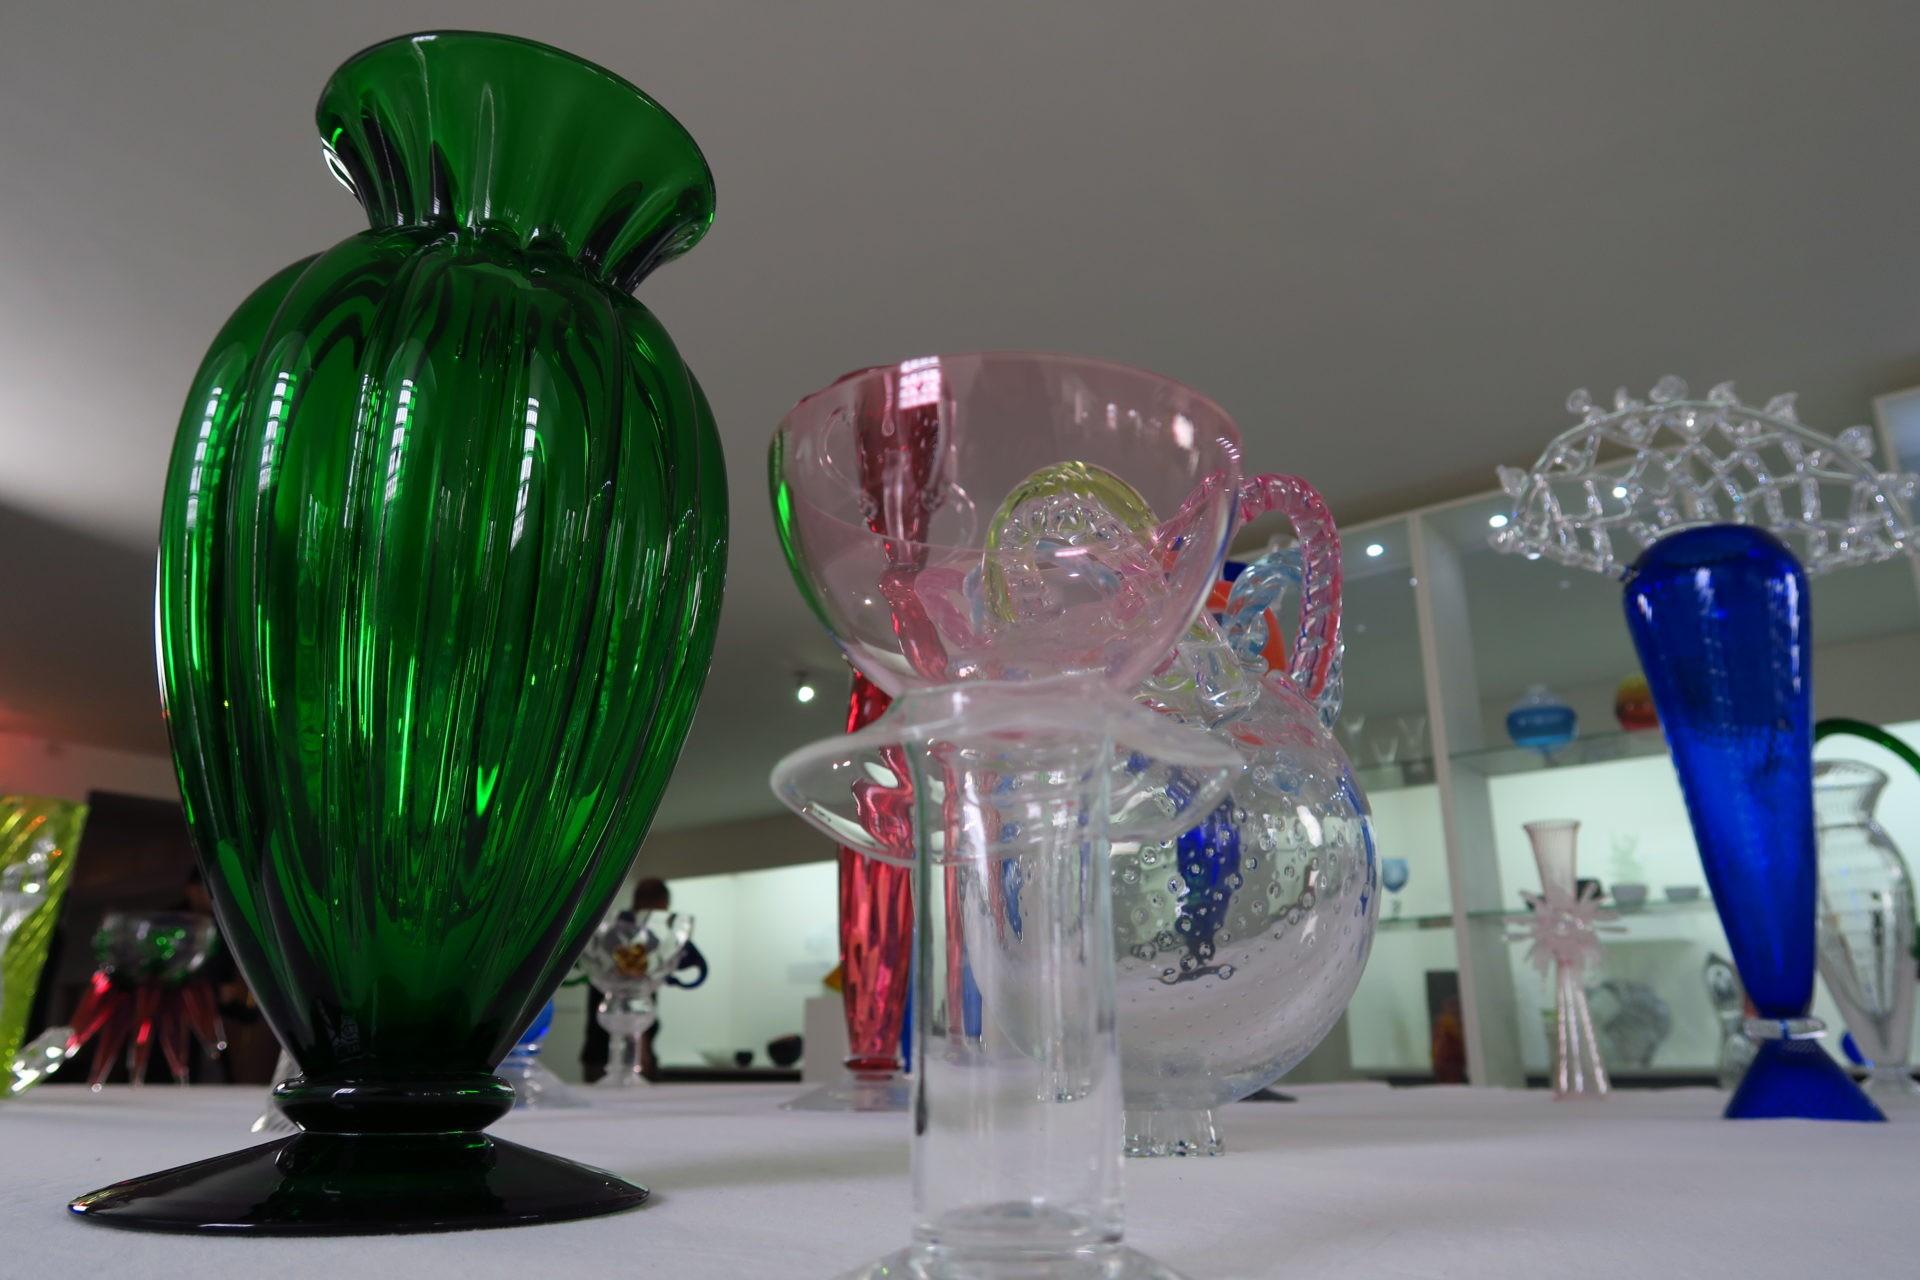 Miminkovsky růžové barvy skla dosáhneme díky erbiu.